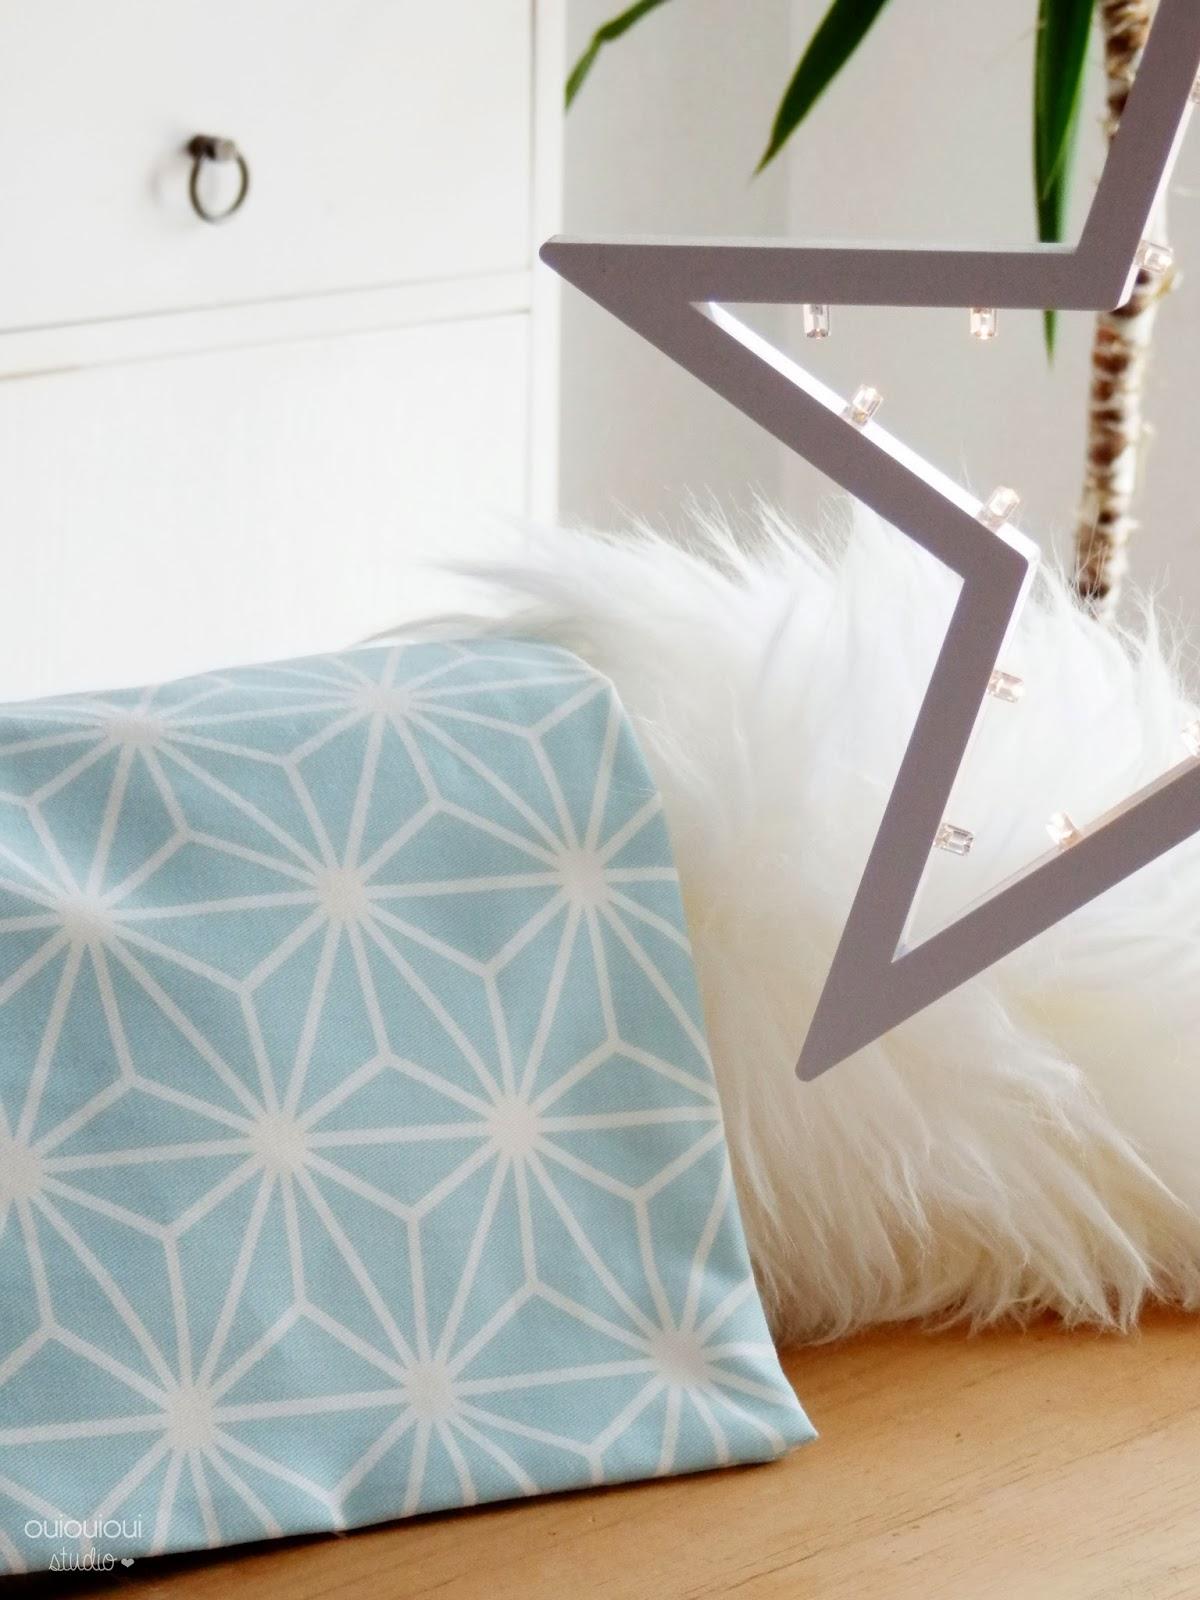 cool oui oui oui studio with papier peint ikea. Black Bedroom Furniture Sets. Home Design Ideas